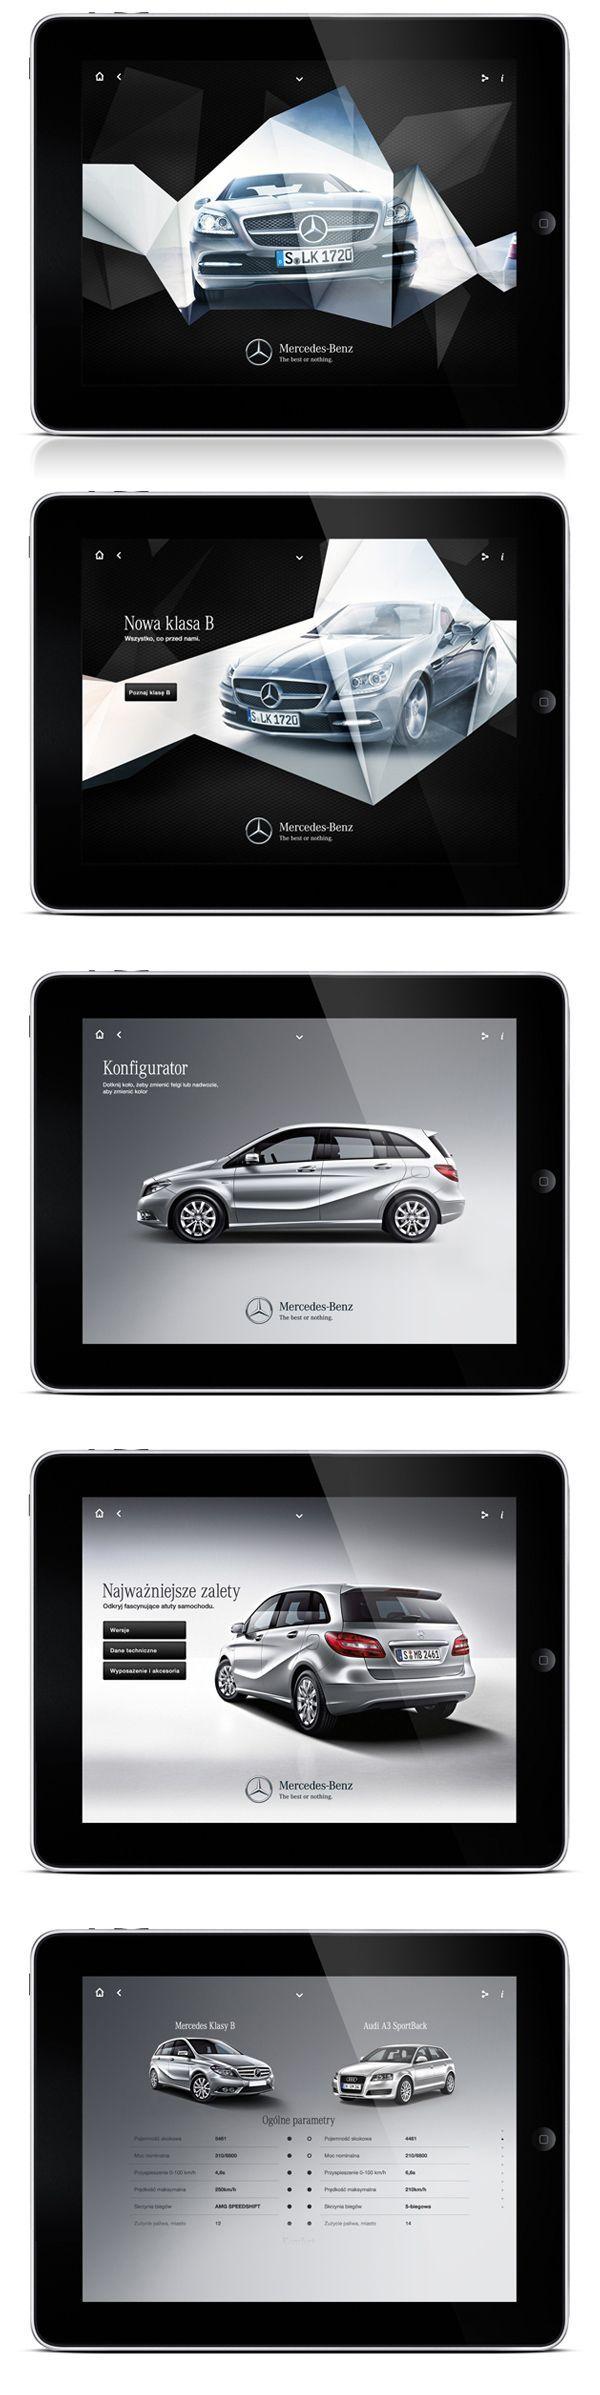 Mercedes iPad app ui design by maciej mach http://www.behance.net/maciejmach